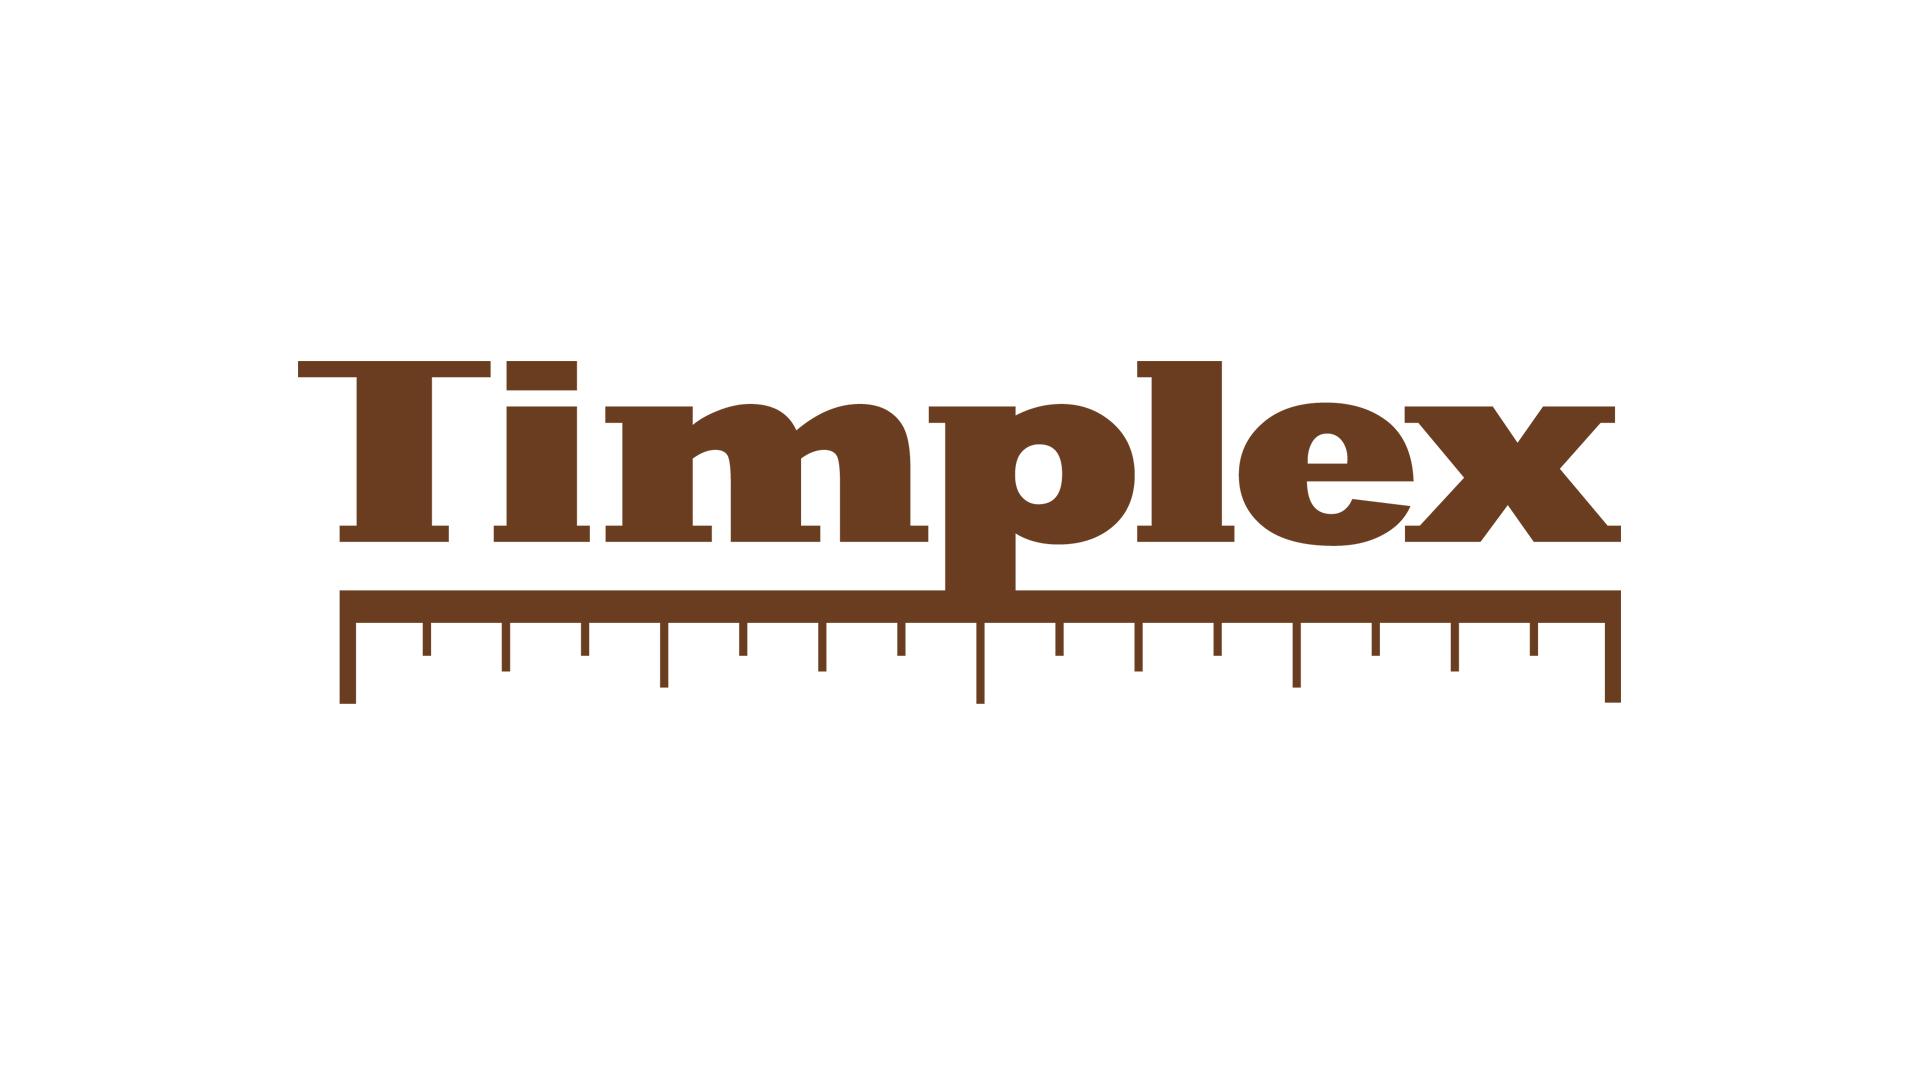 TIMPLEX